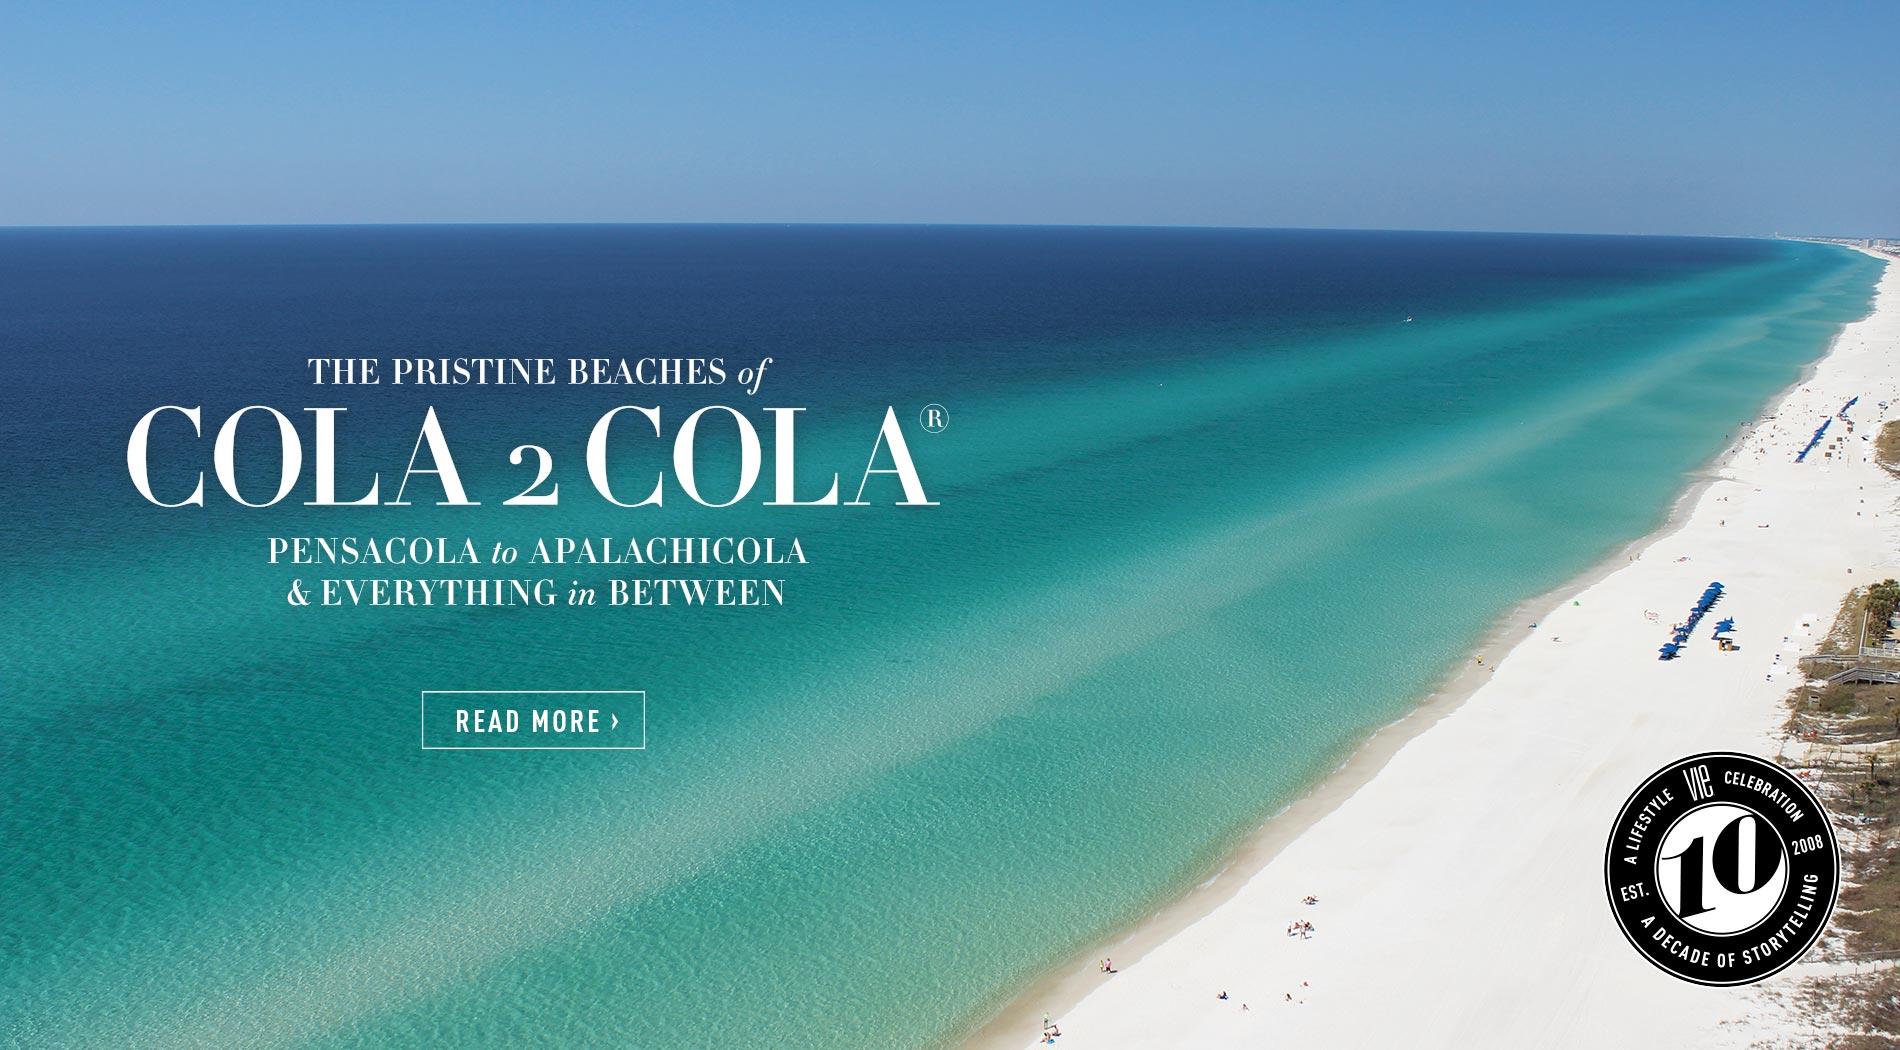 VIE Magazine, February 2018, Destination Travel Issue, Pensacola to Apalachicola Florida Travel Guide